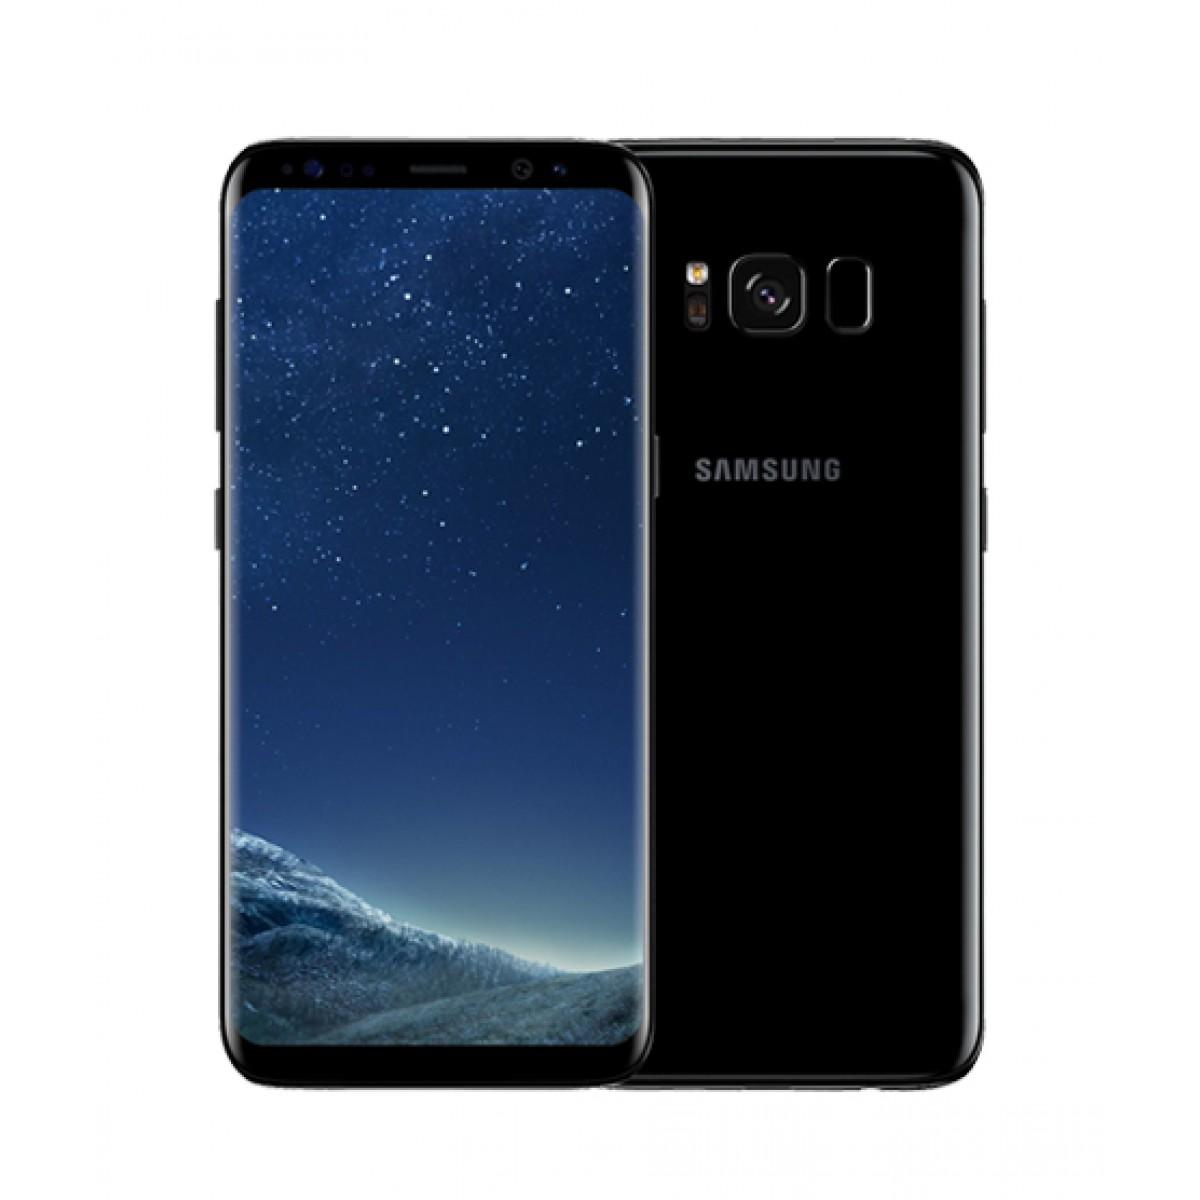 Samsung Galaxy S8 64GB Dual Sim Midnight Black (G950FD)